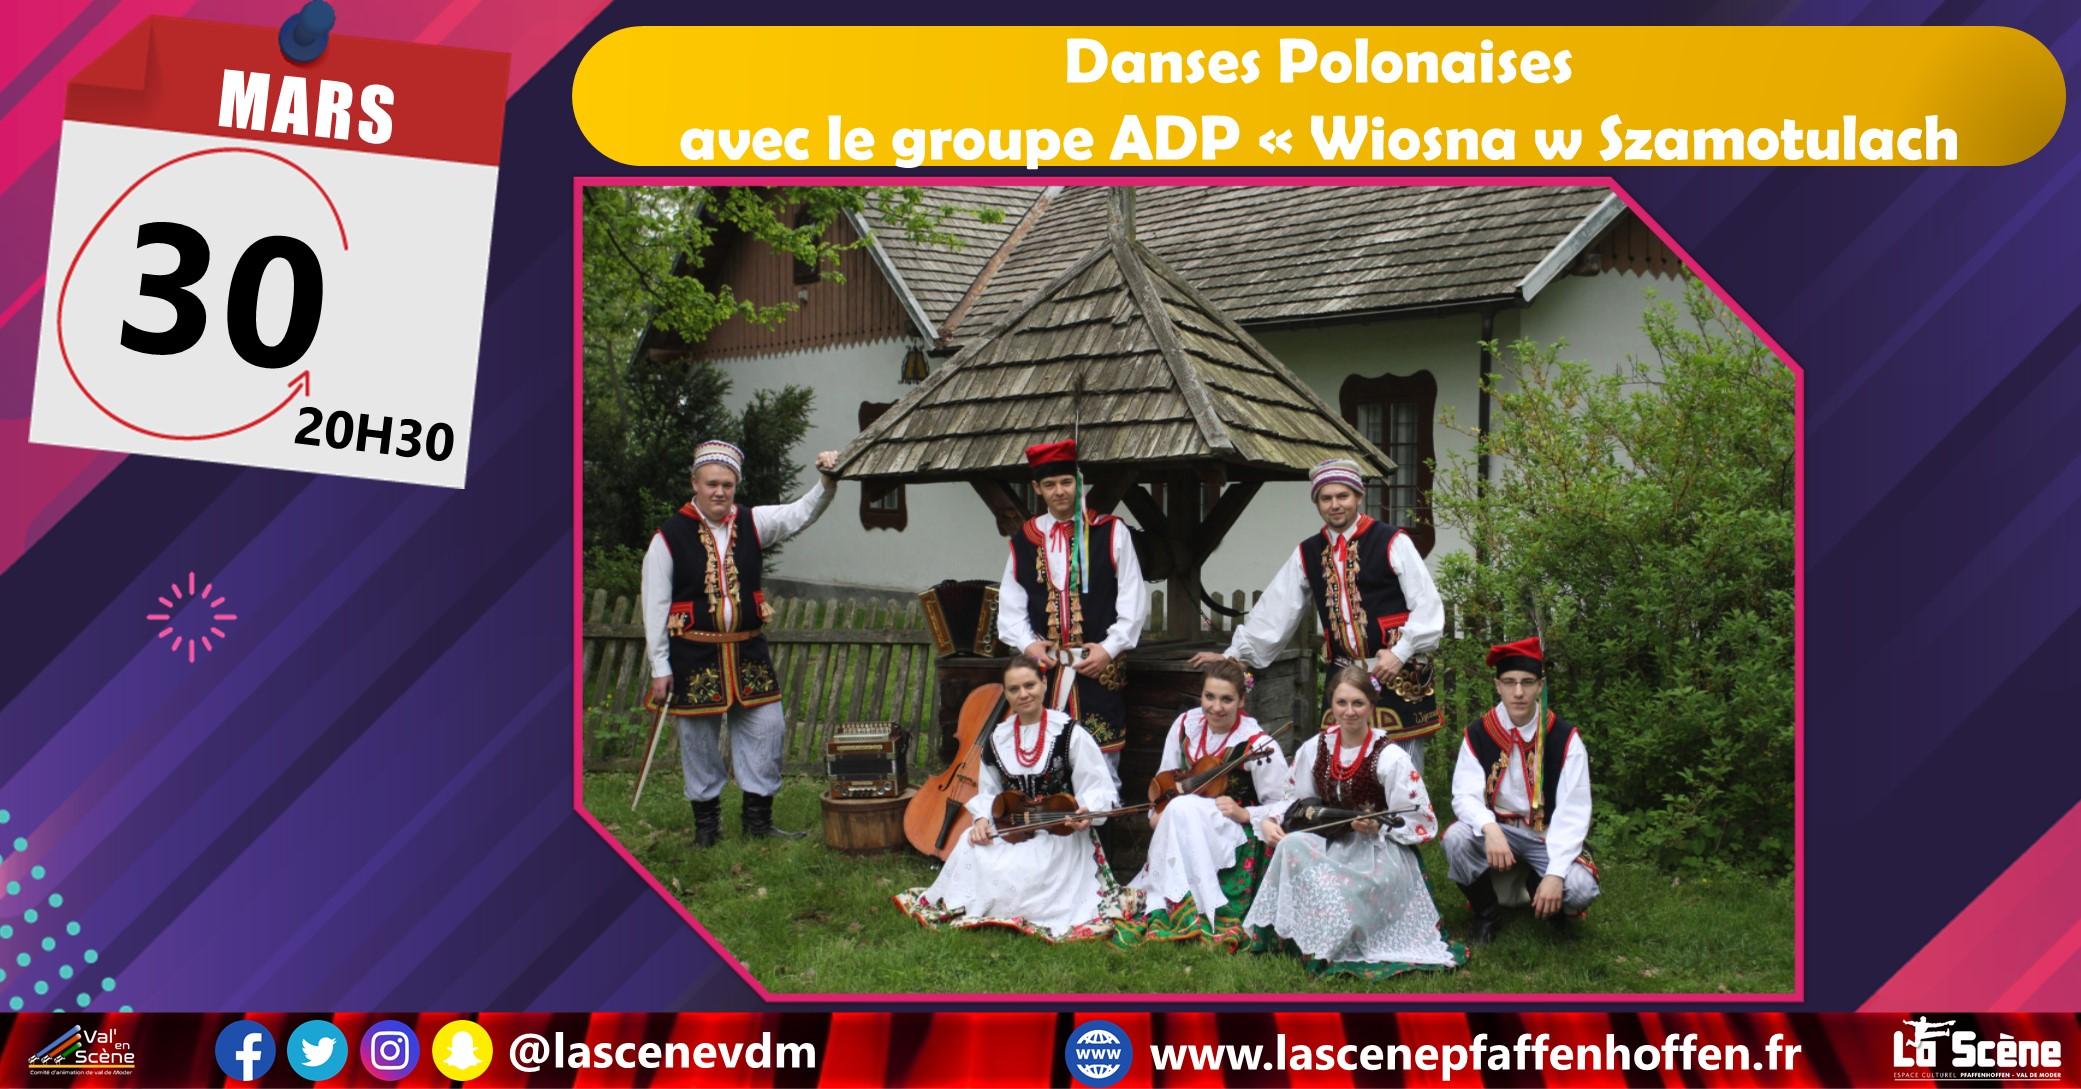 Danses Polonaises avec le groupe ADP « Wiosna w Szamotulach »